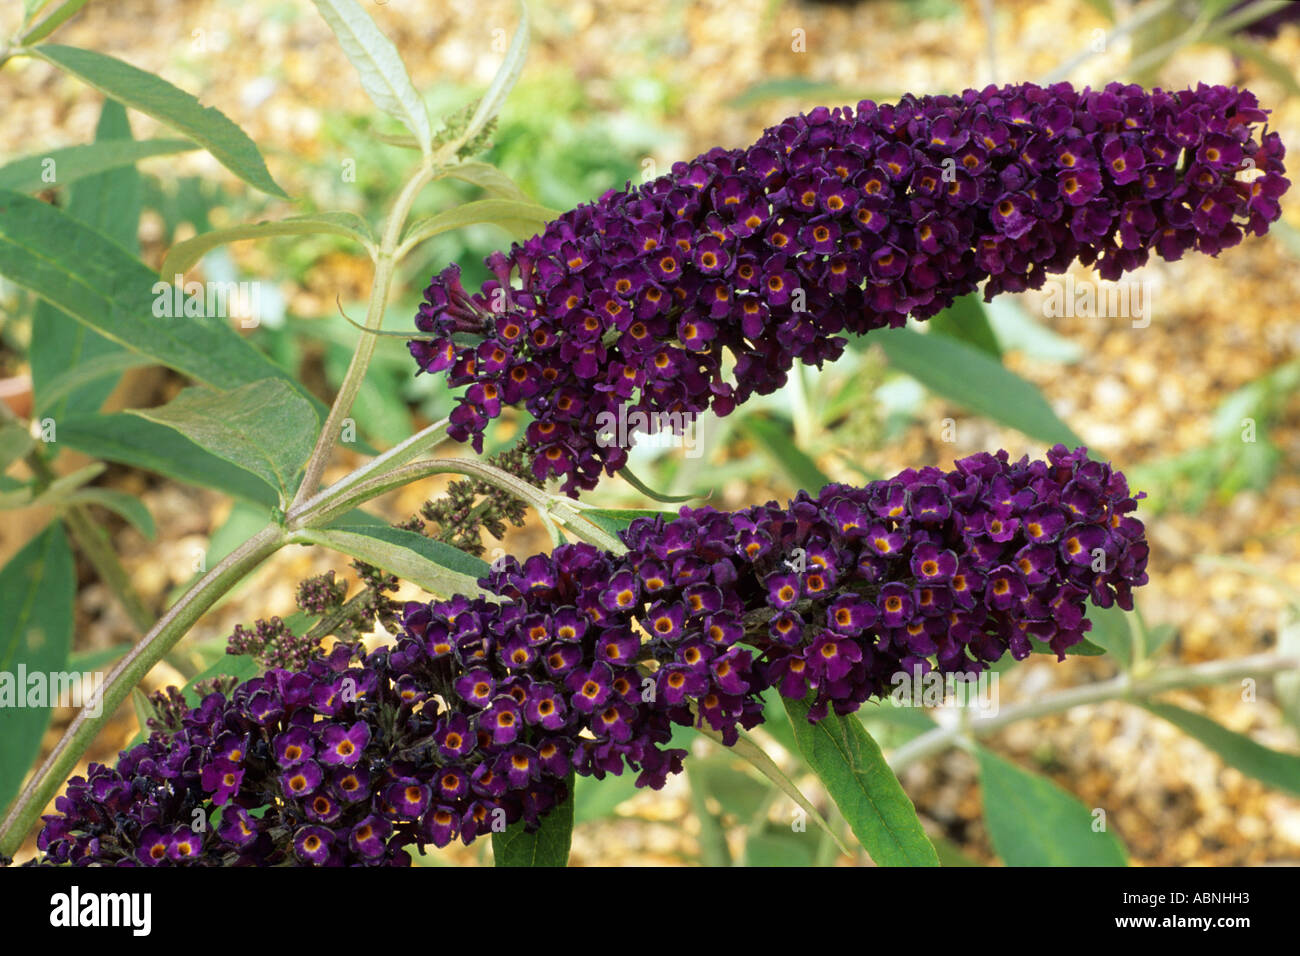 buddleia davidii 39 black knight 39 butterfly bush dark purple flower stock photo royalty free. Black Bedroom Furniture Sets. Home Design Ideas